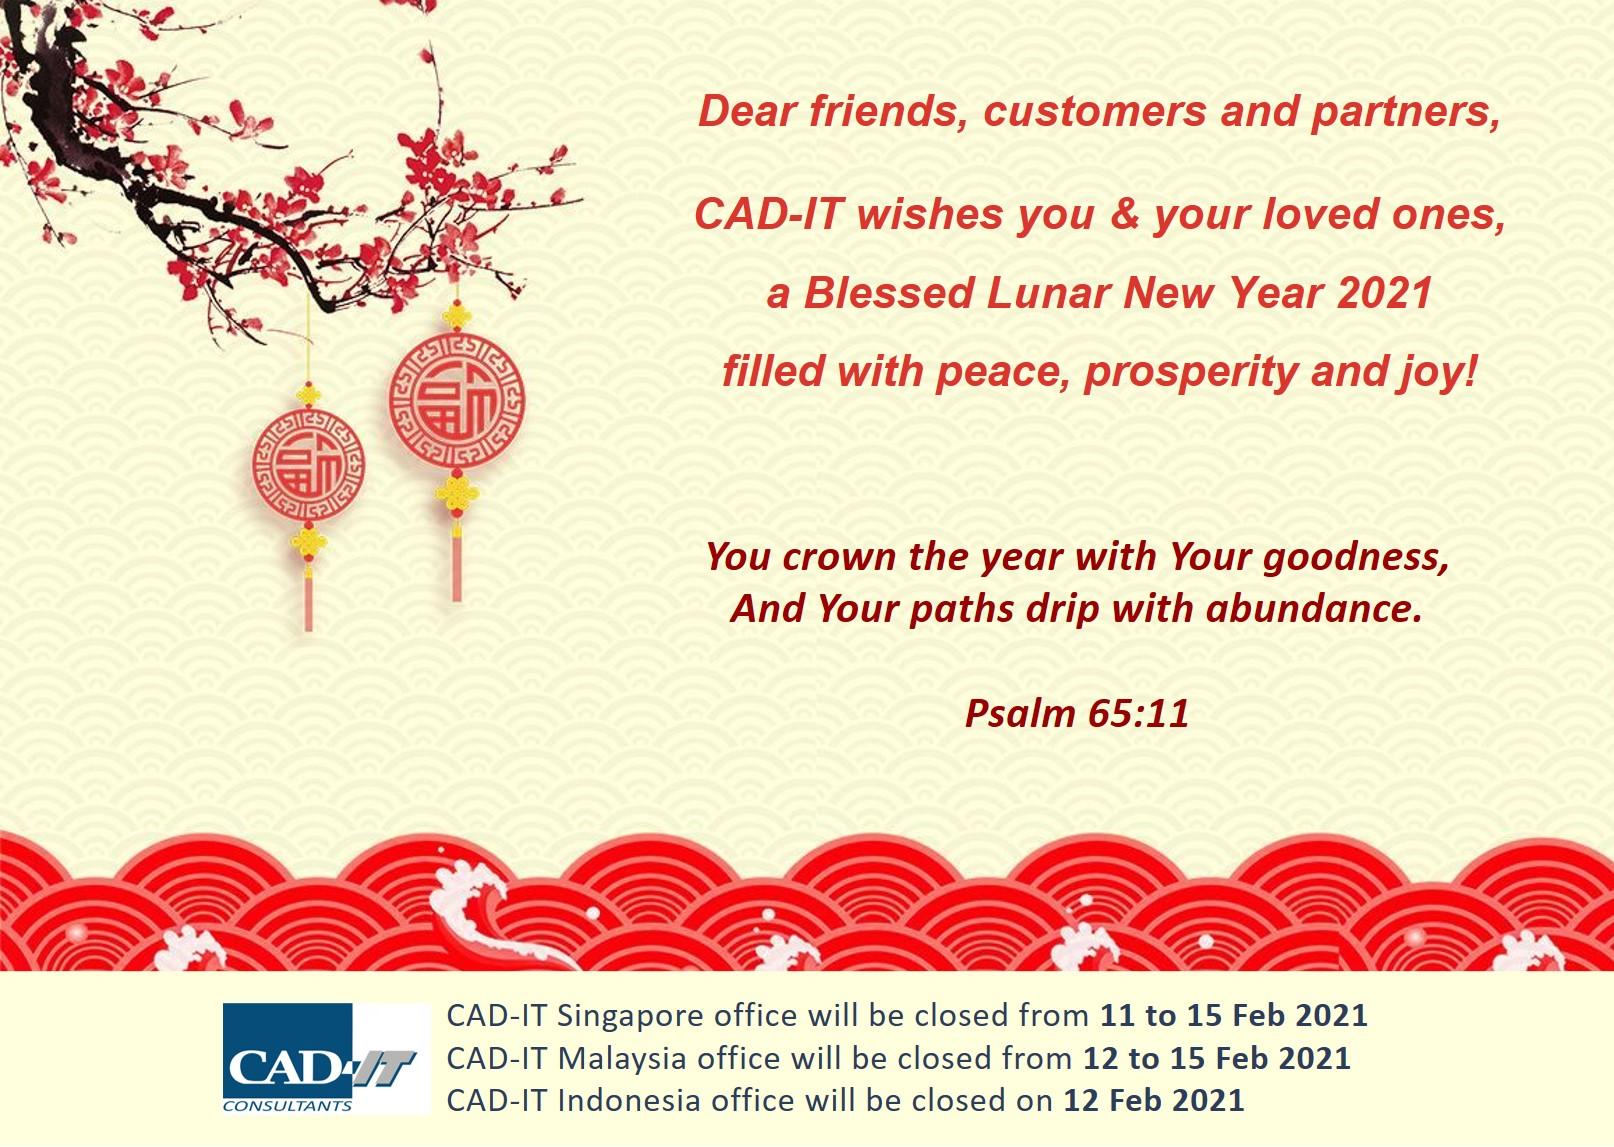 CNY 2021 Greetings